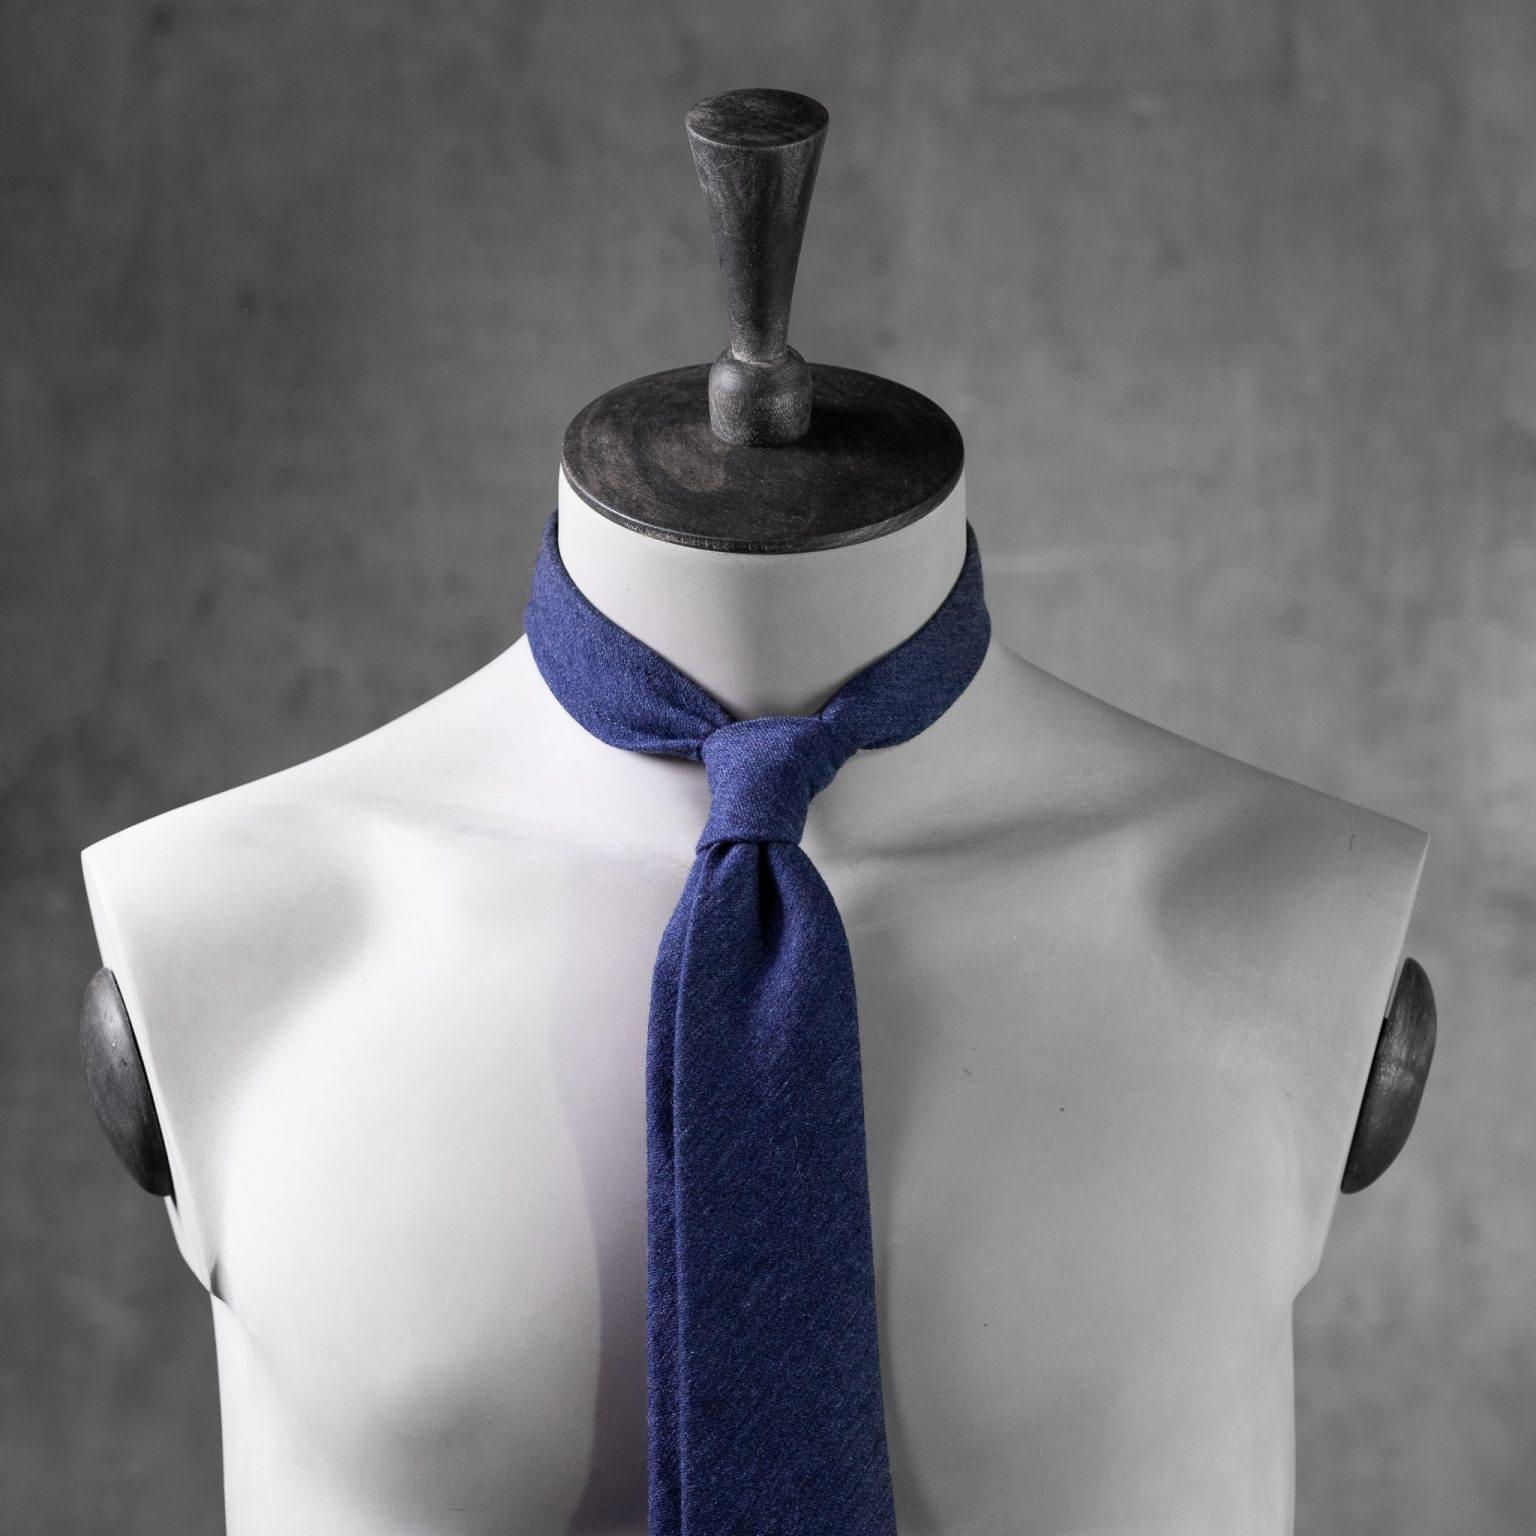 WOOL-LANA-0474-Tie-Initials-Corbata-Iniciales-The-Seelk-3